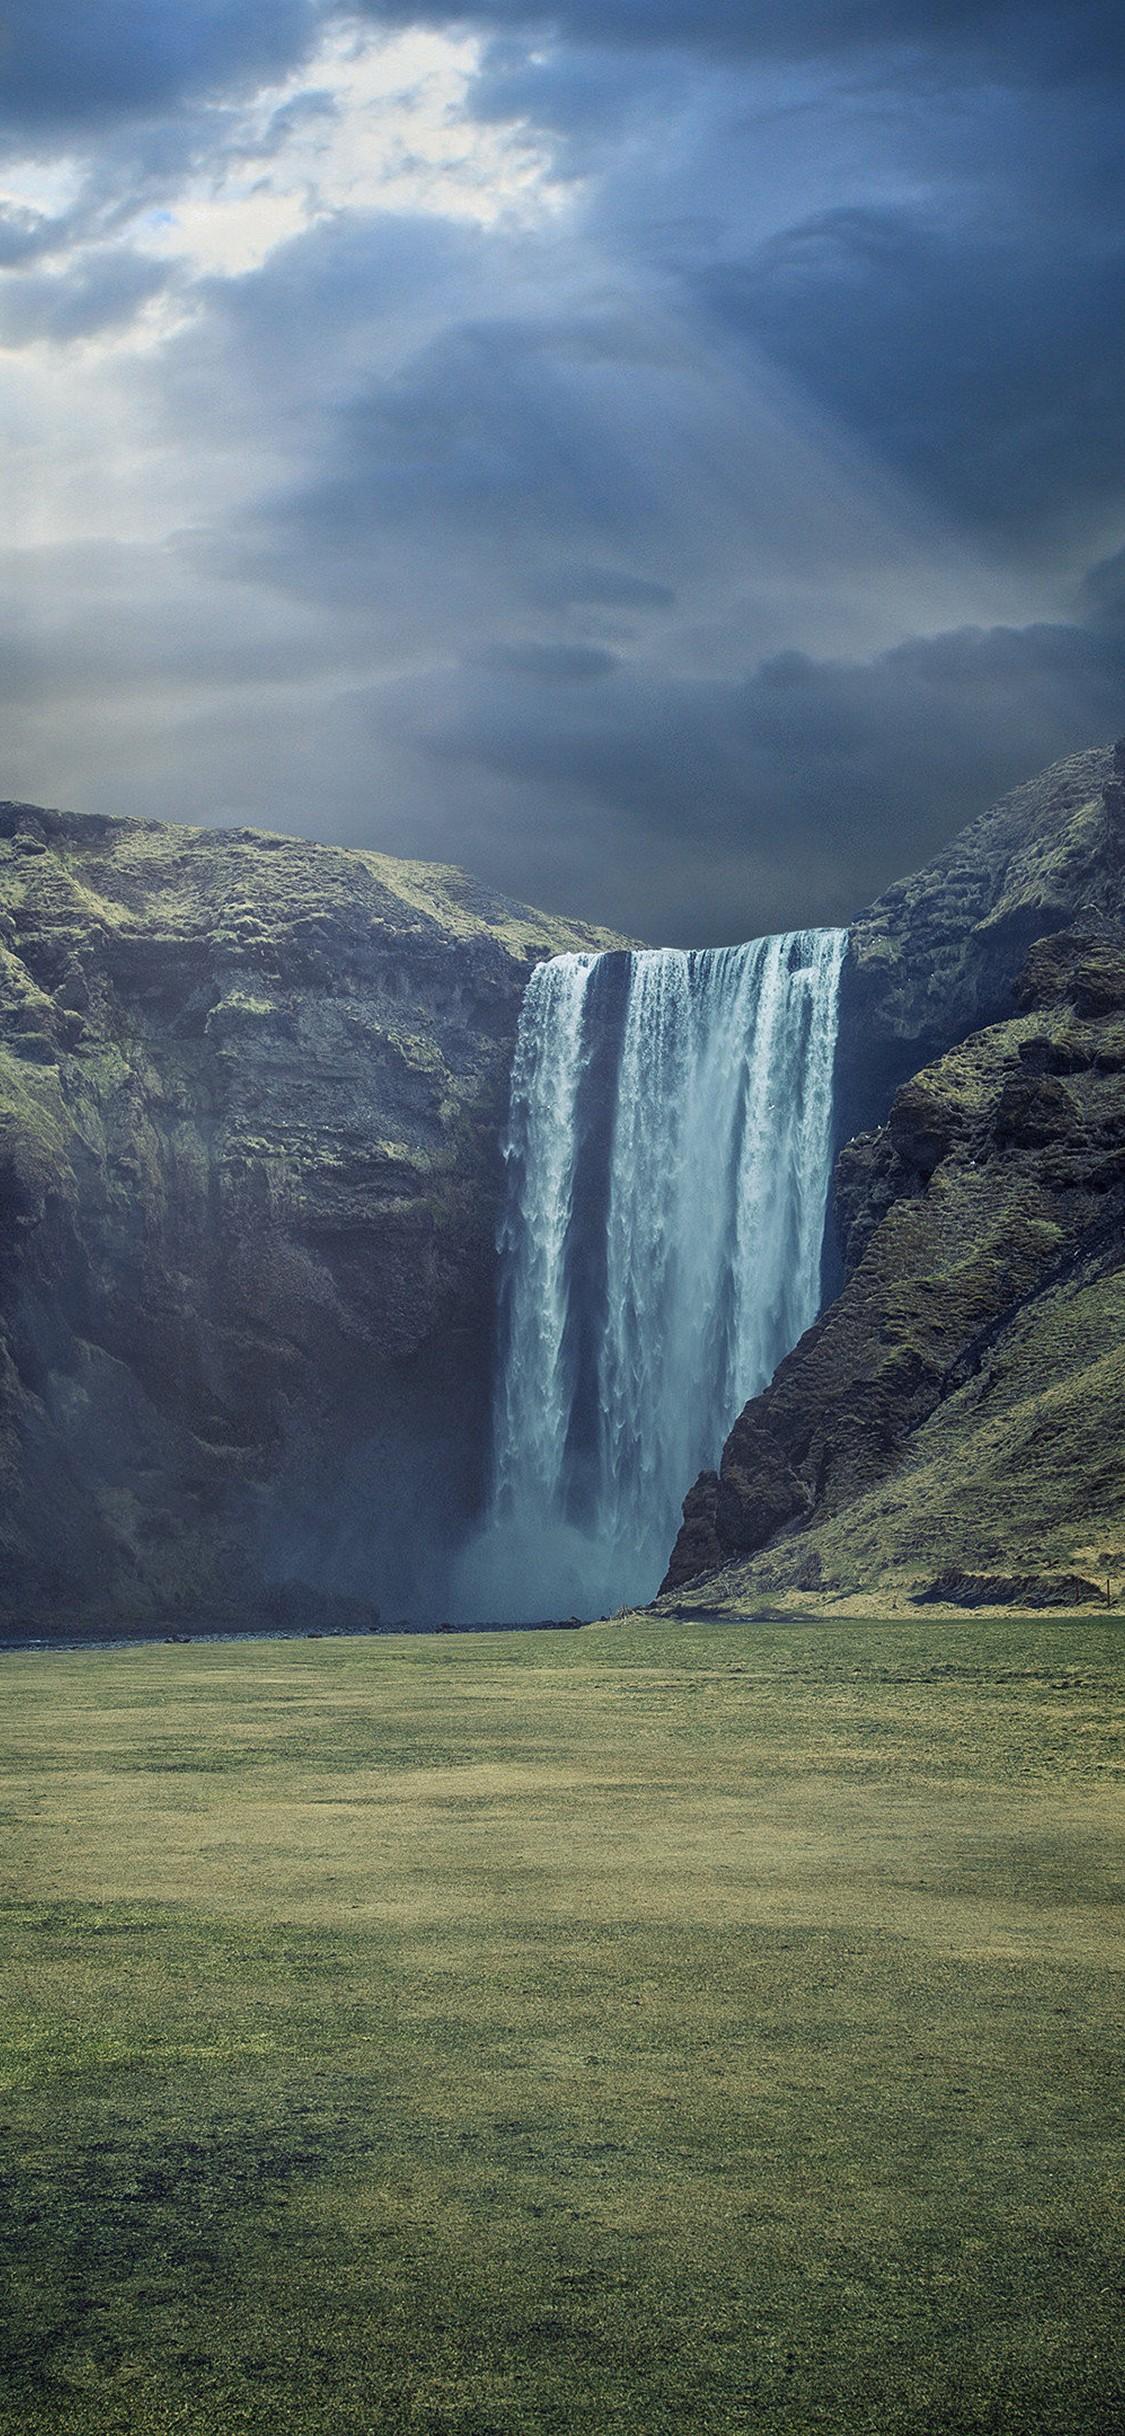 4k Wallpaper 3d 3840x2400 Waterfall Landscape Hd Wallpaper 1125x2436